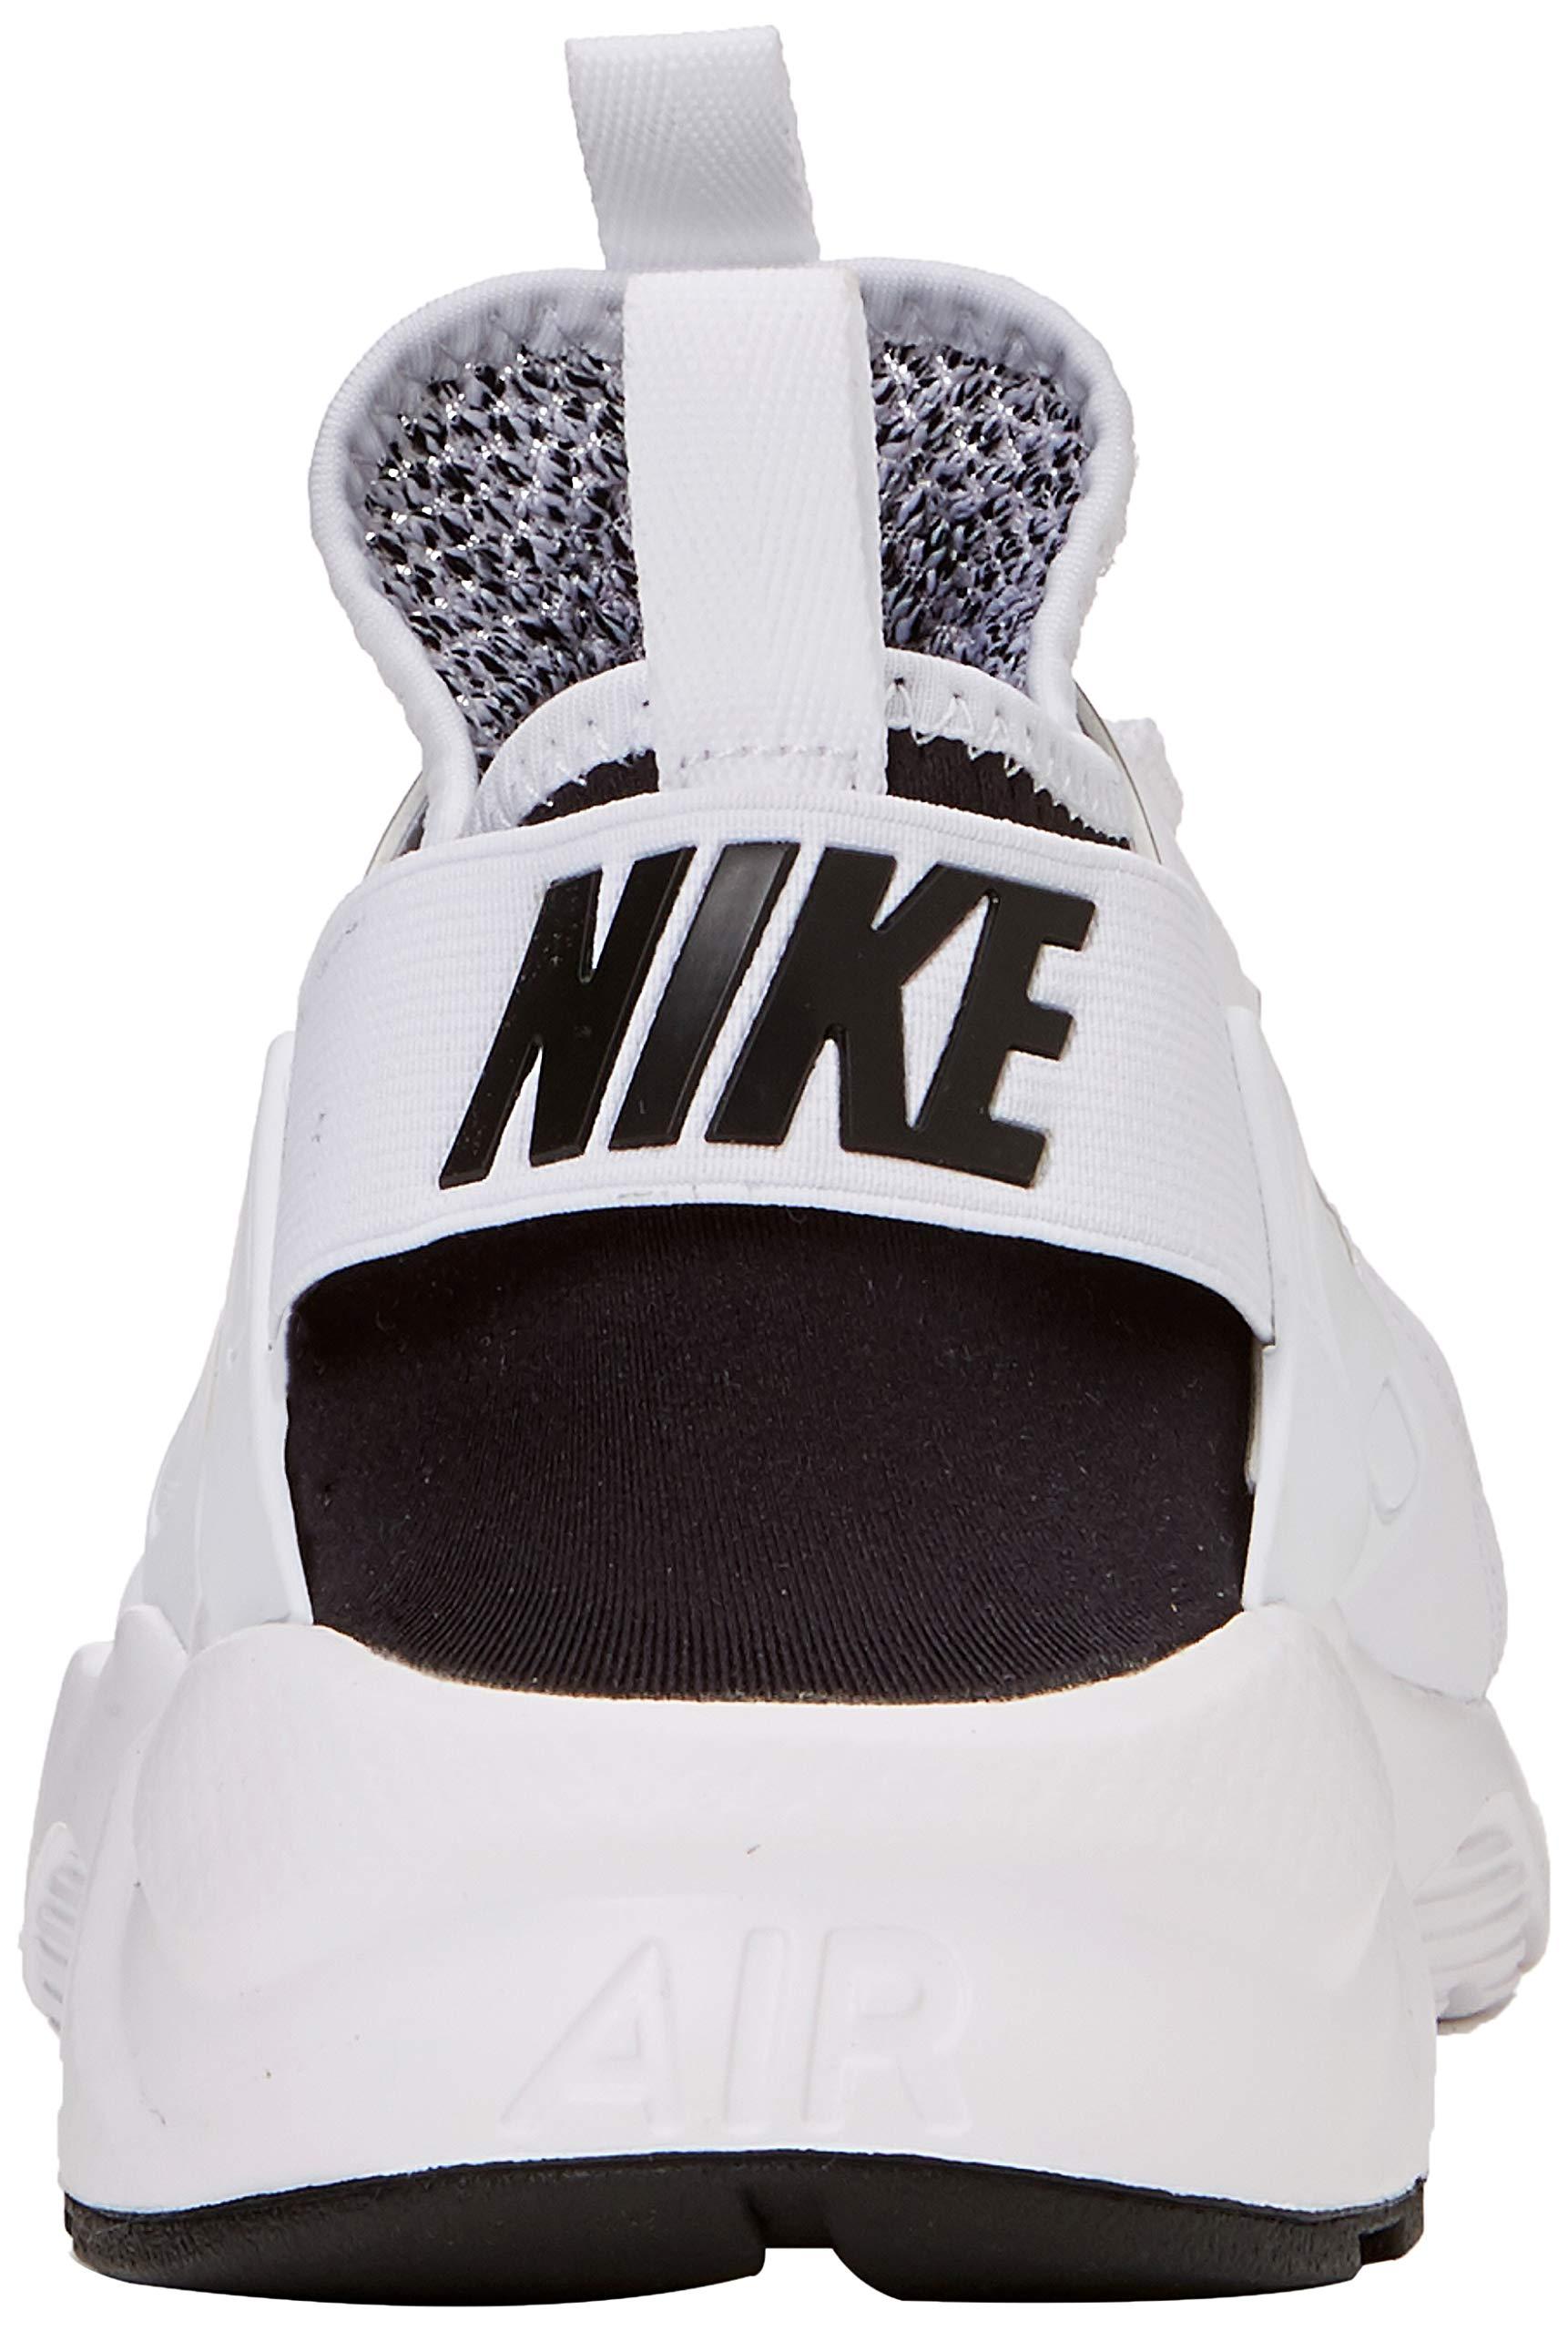 71Yy73kYSeL - Nike Men's Air Huarache Run Ultra Se Gymnastics Shoes